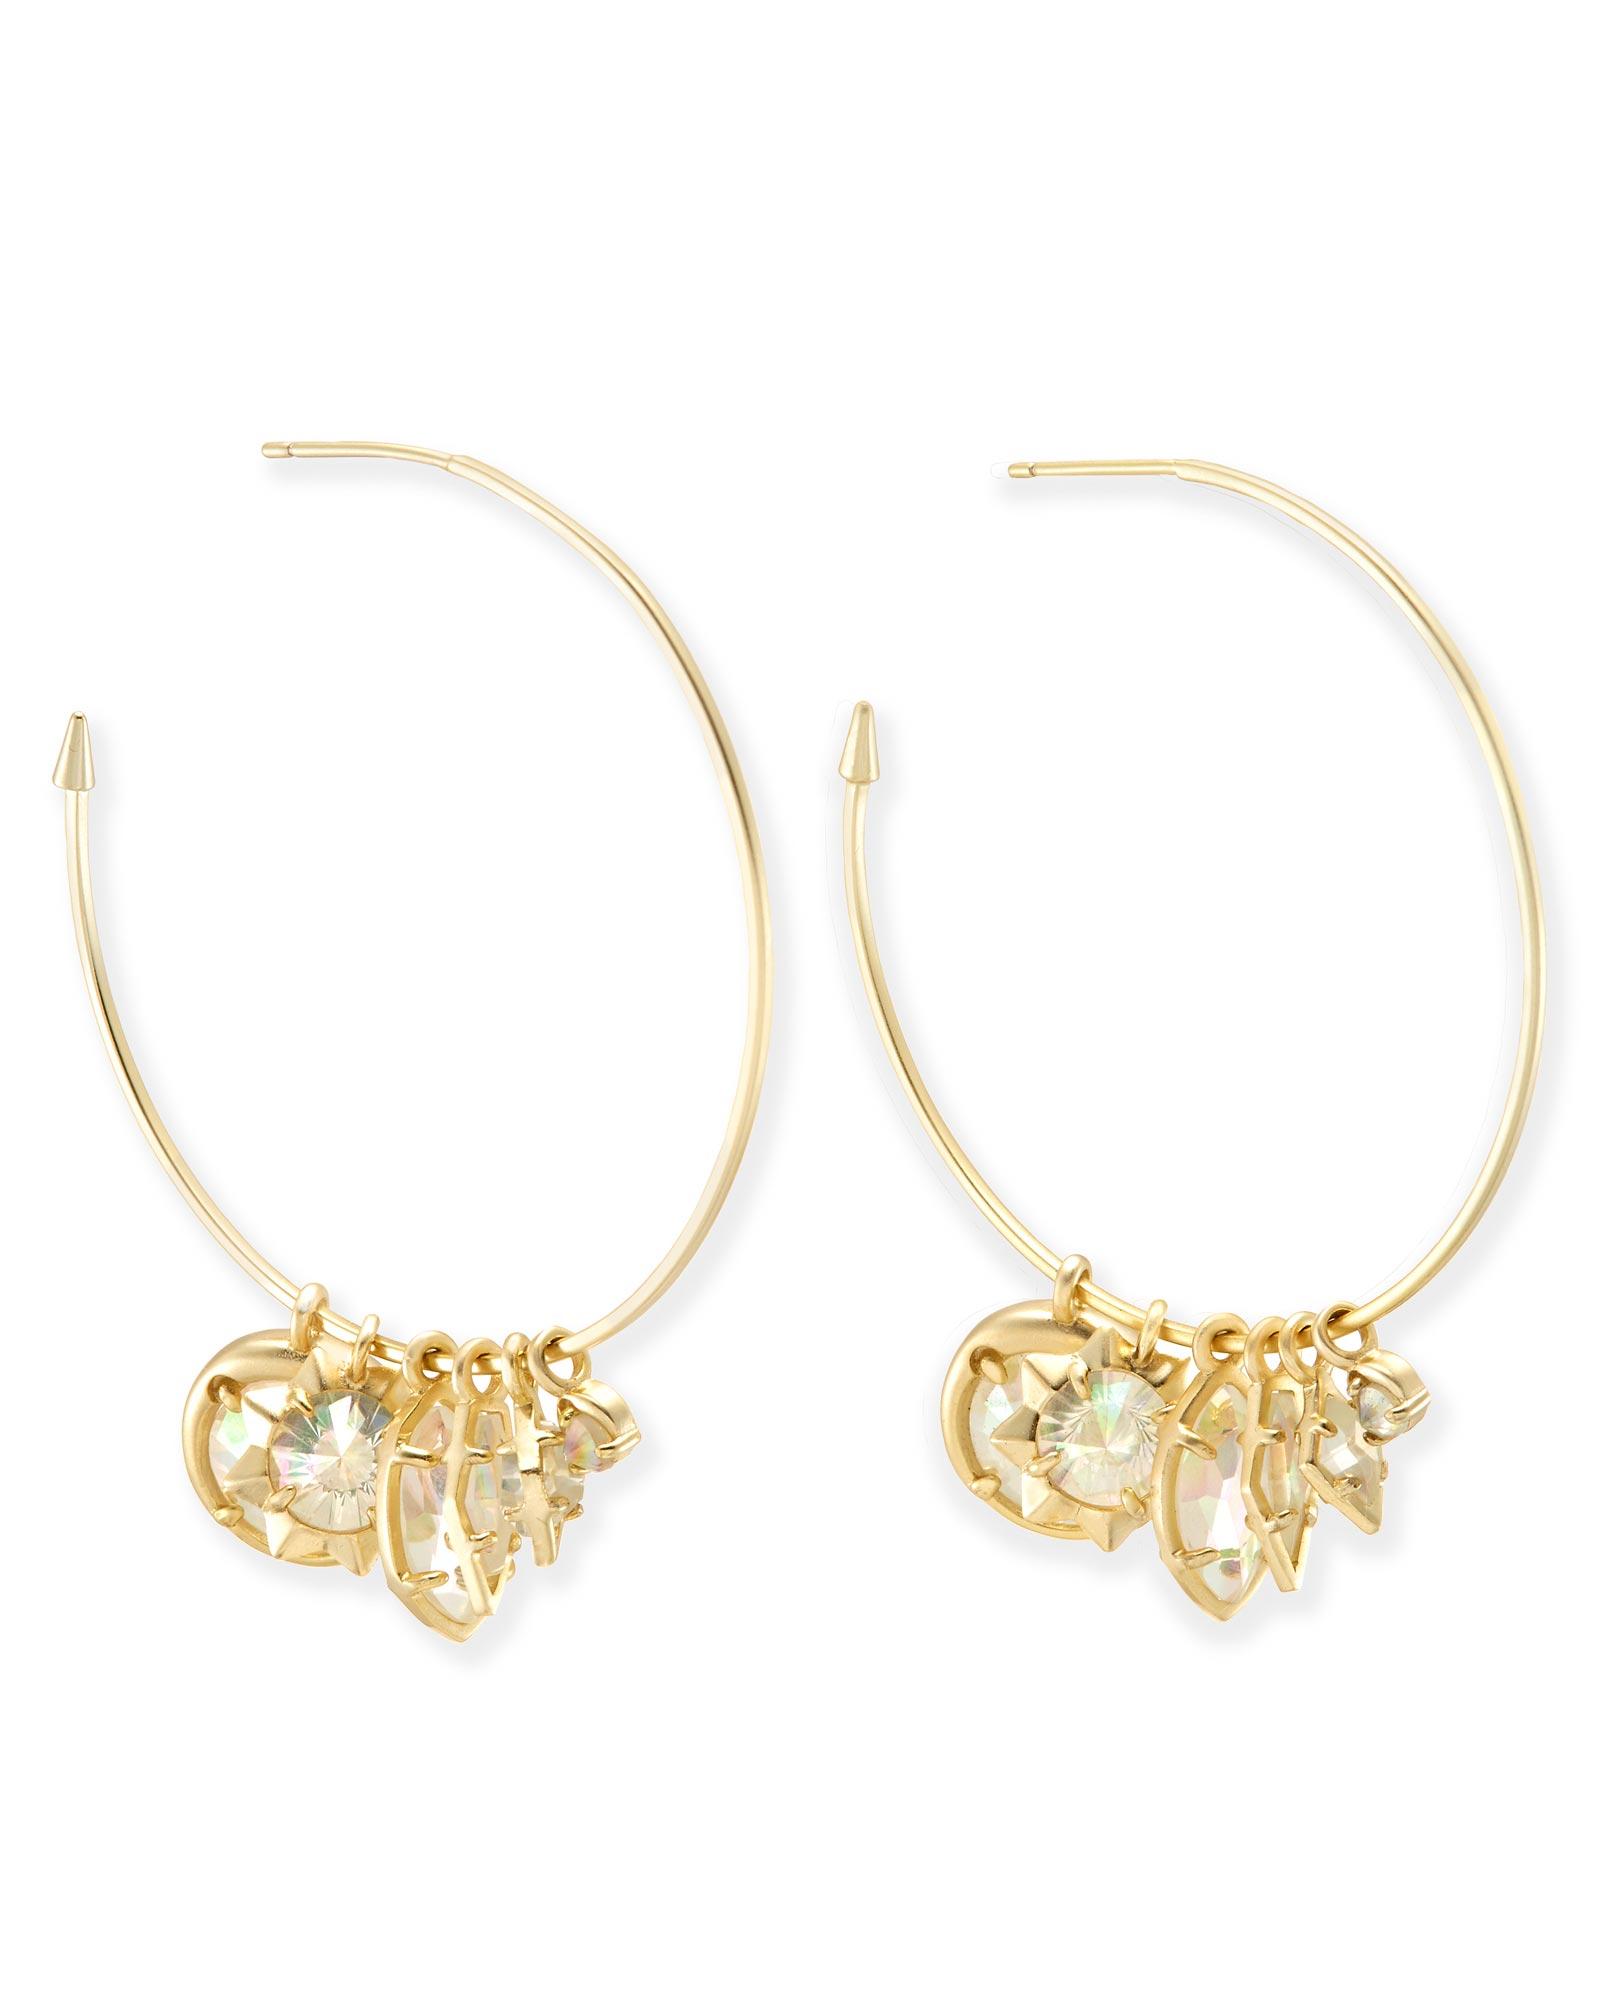 Alyssa Charm Hoop Earrings In Gold